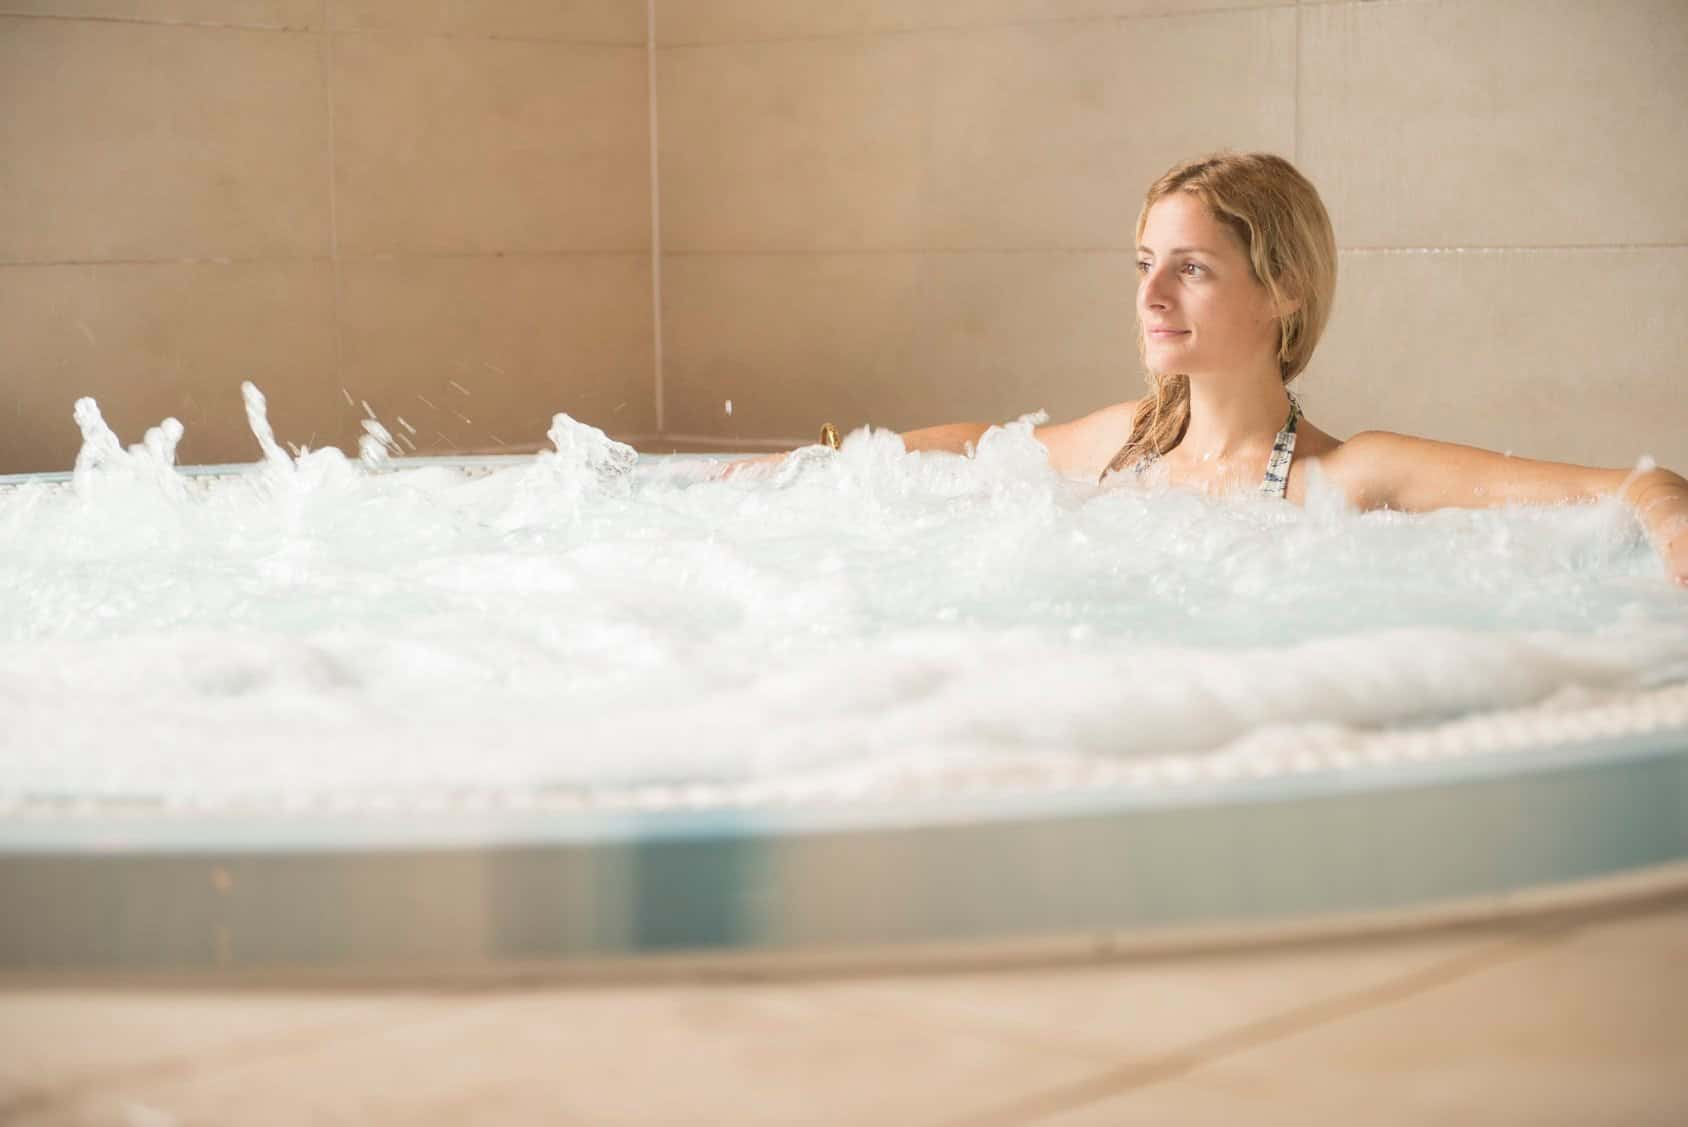 Trenython Manor hot tub